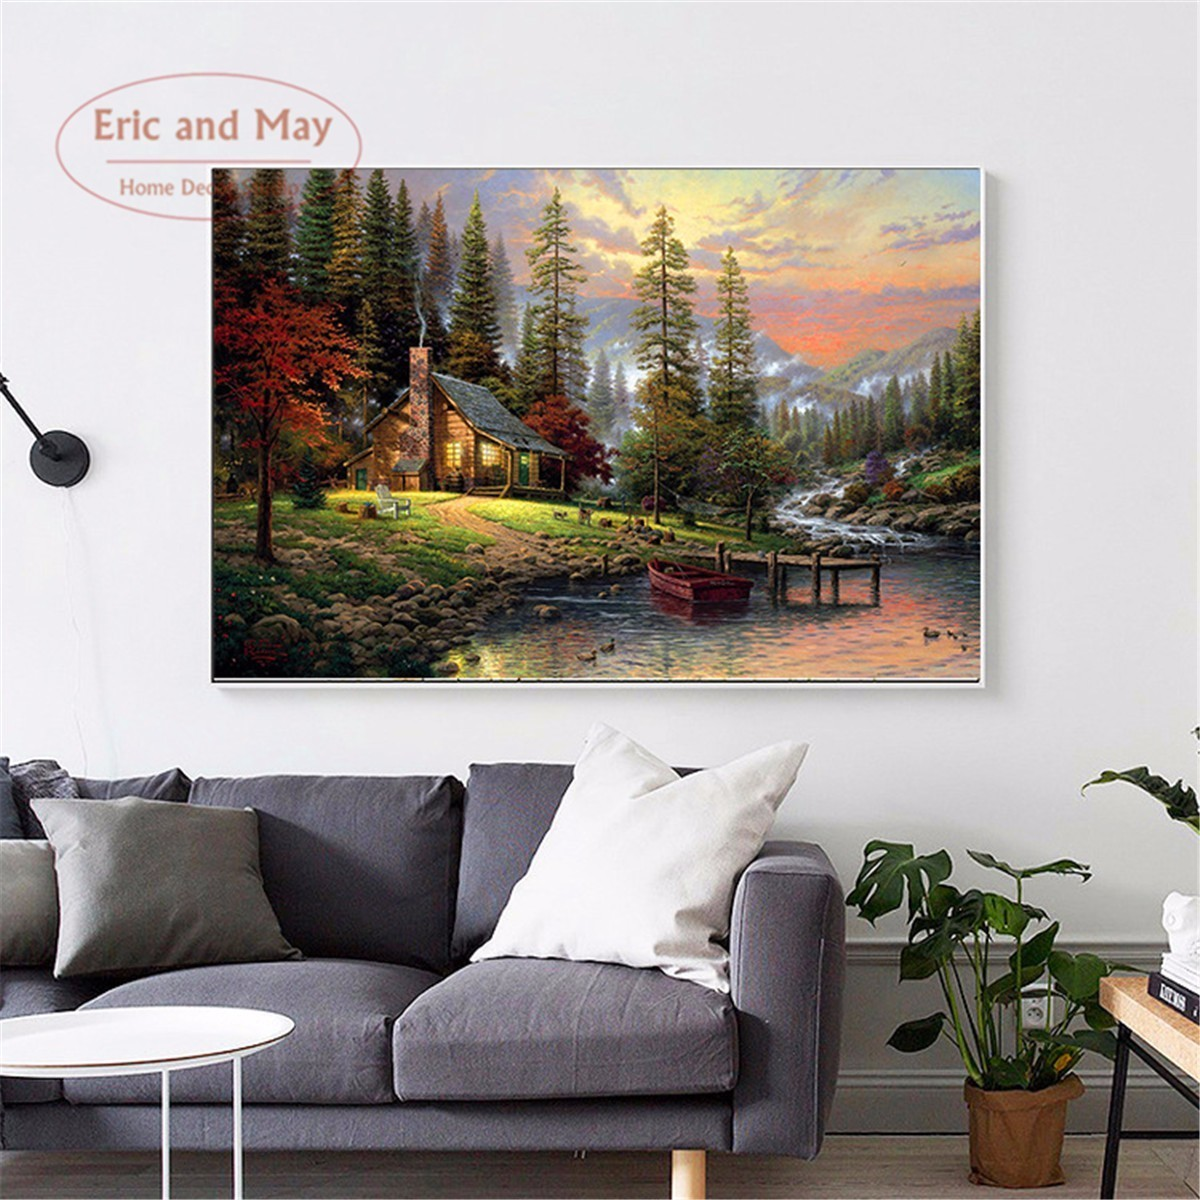 Hutan Dinding Landscape Minyak Lukisan Dengan Angka Pinturas Gambar Cuadros Decoracion Kanvas Minyak Lukisan Mewarnai Dengan Nom